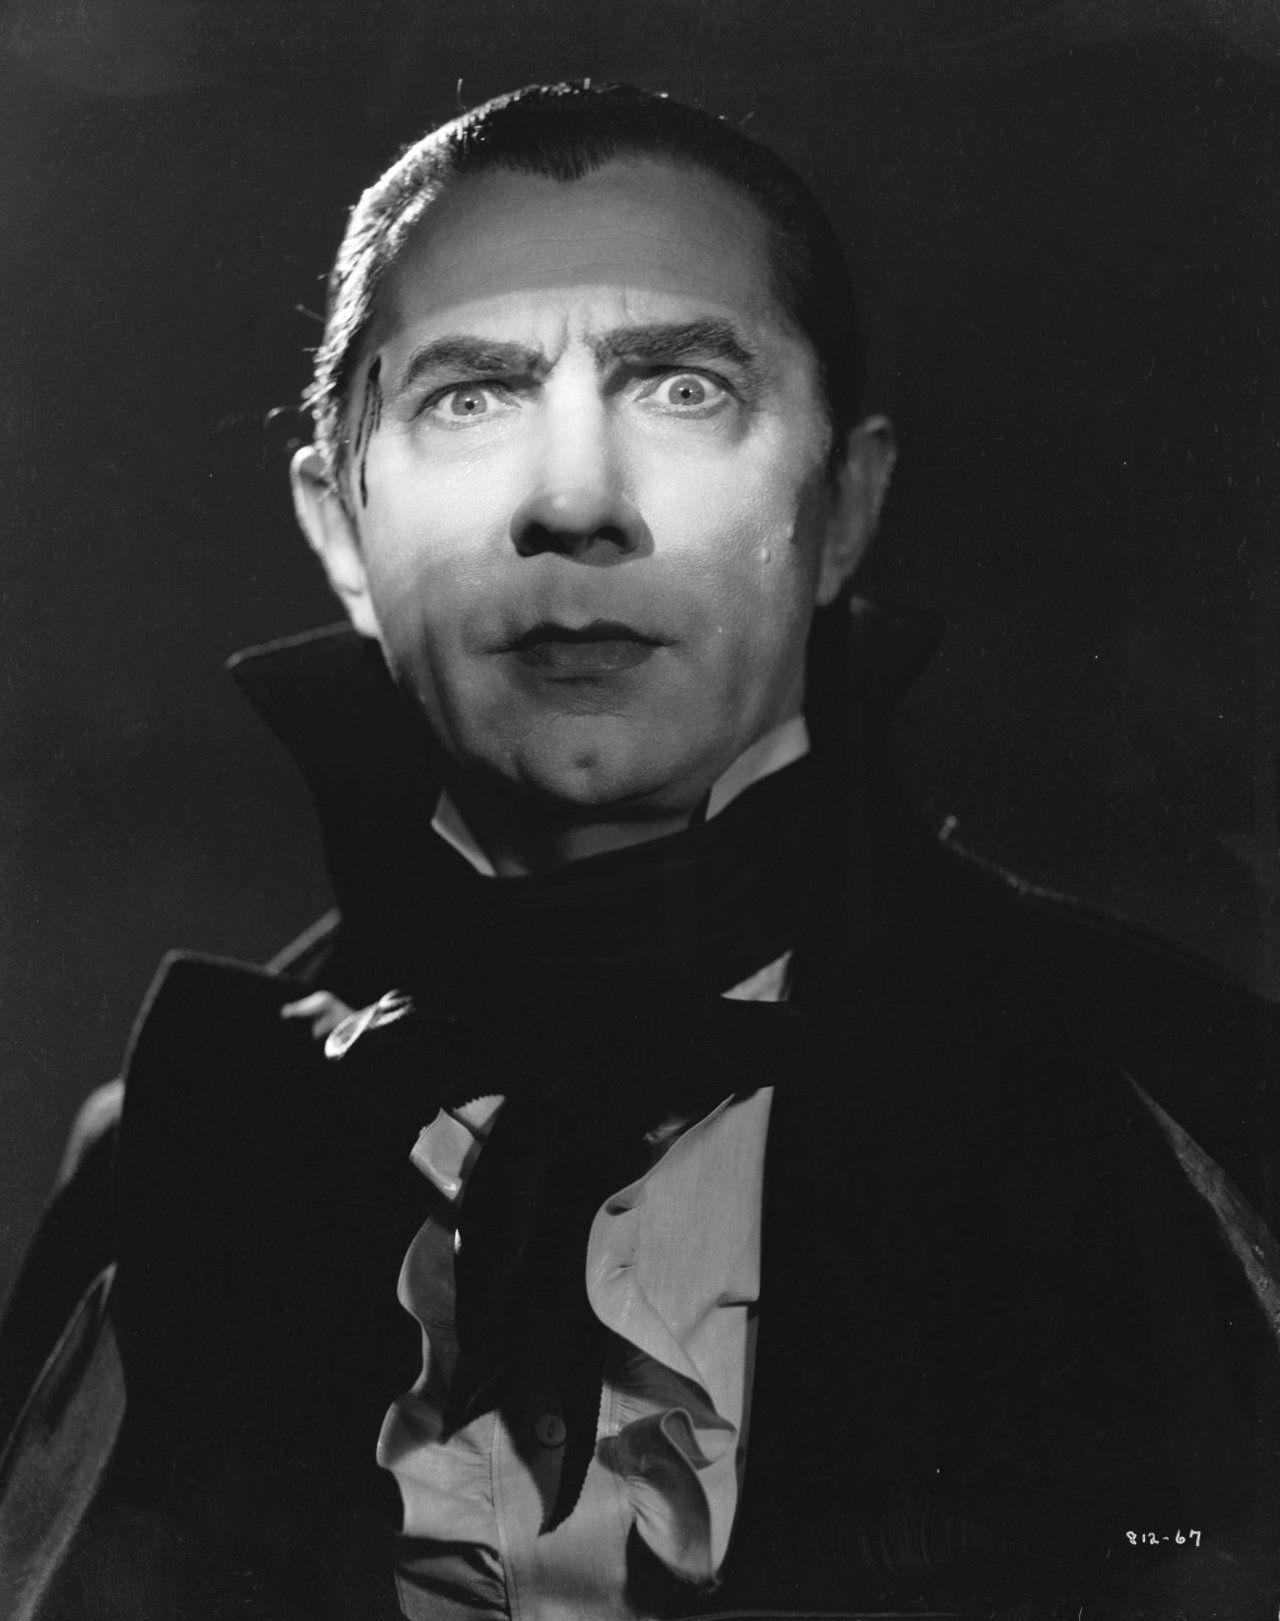 bram stoker s dracula used the vampire story to explore bela lugosi en draacutecula dracula 1931